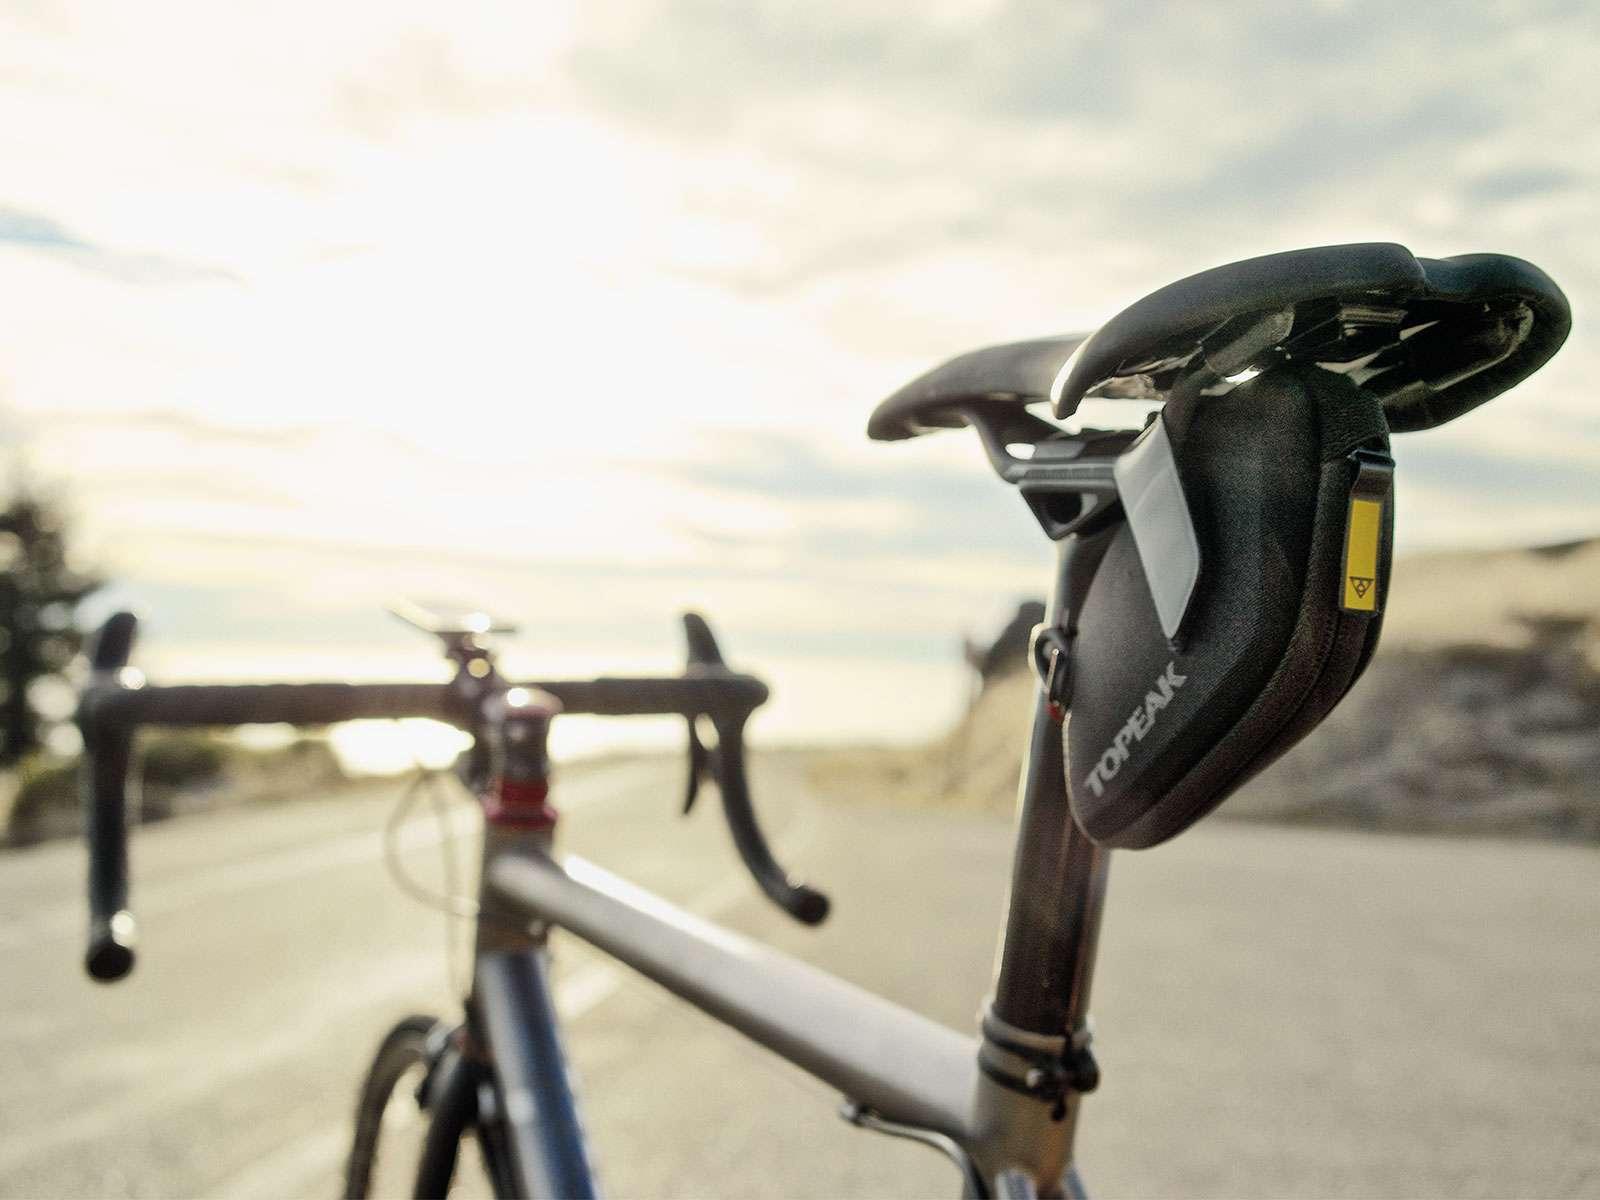 topeak saddle bag for winter road bike